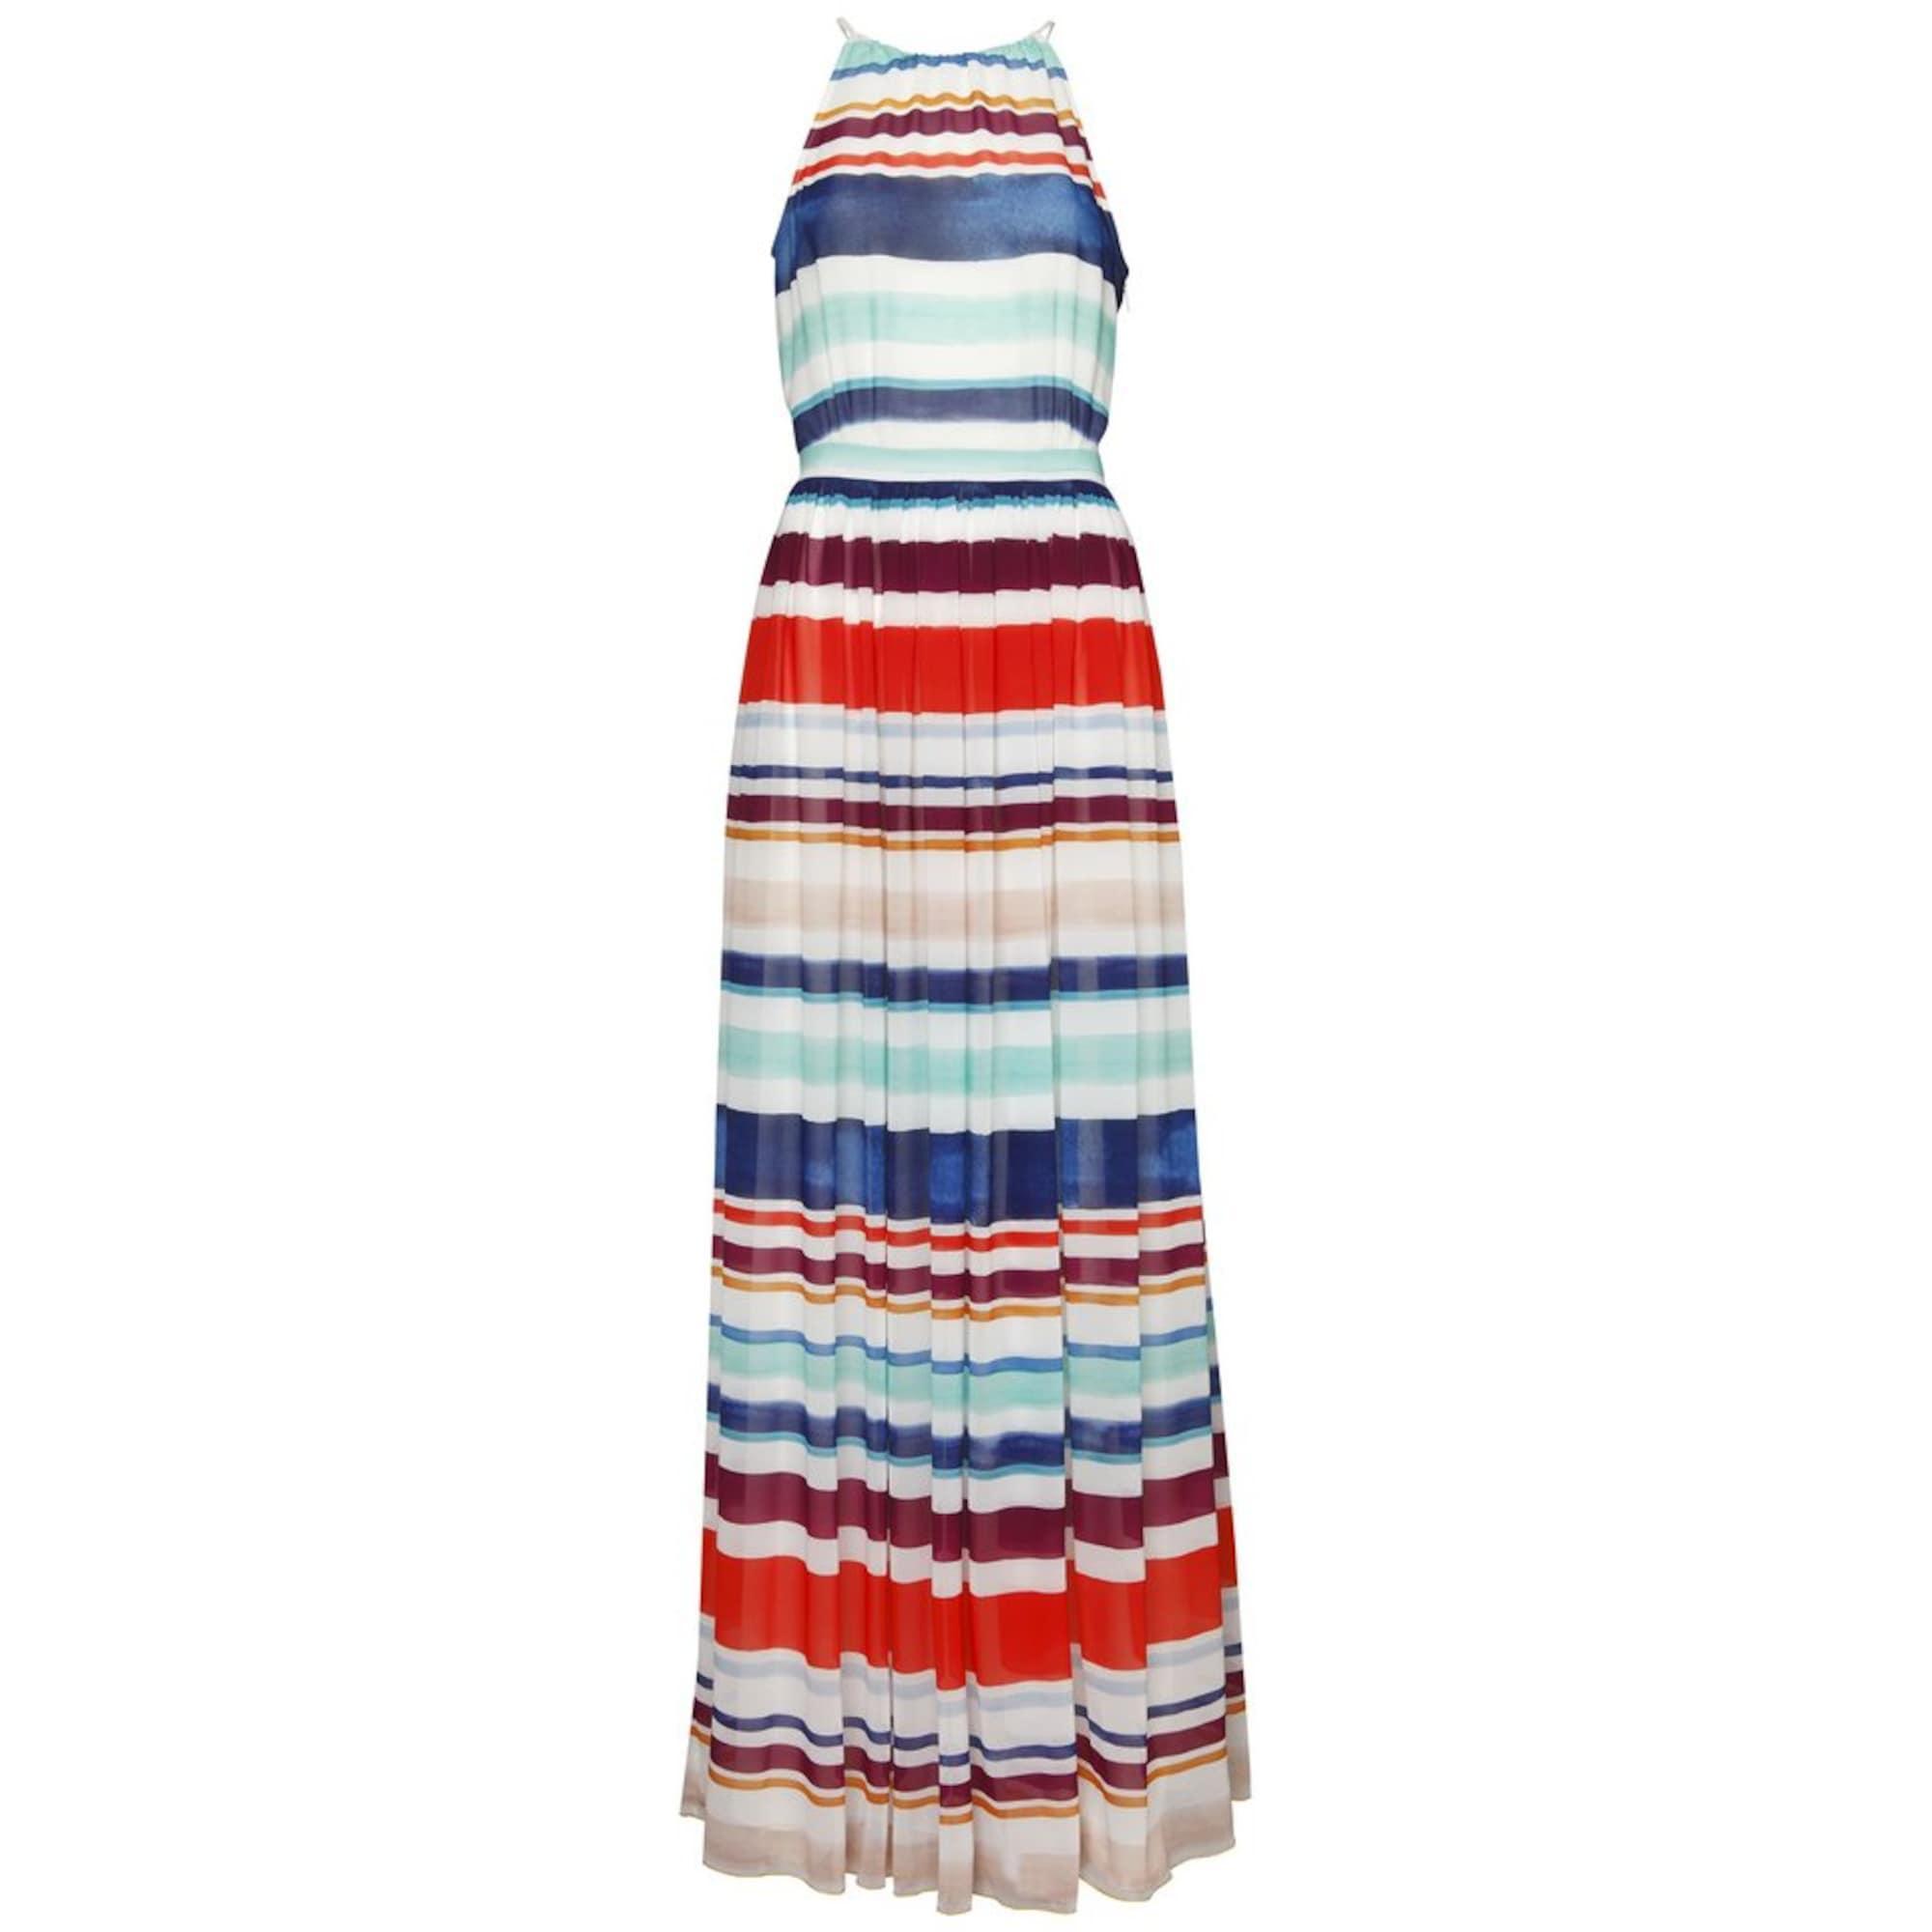 TOMMY HILFIGER, Dames Zomerjurk 'AGATHA CHIFFON MAXI DRESS', beige / lichtblauw / donkerblauw / oker / rood / donkerrood / wit